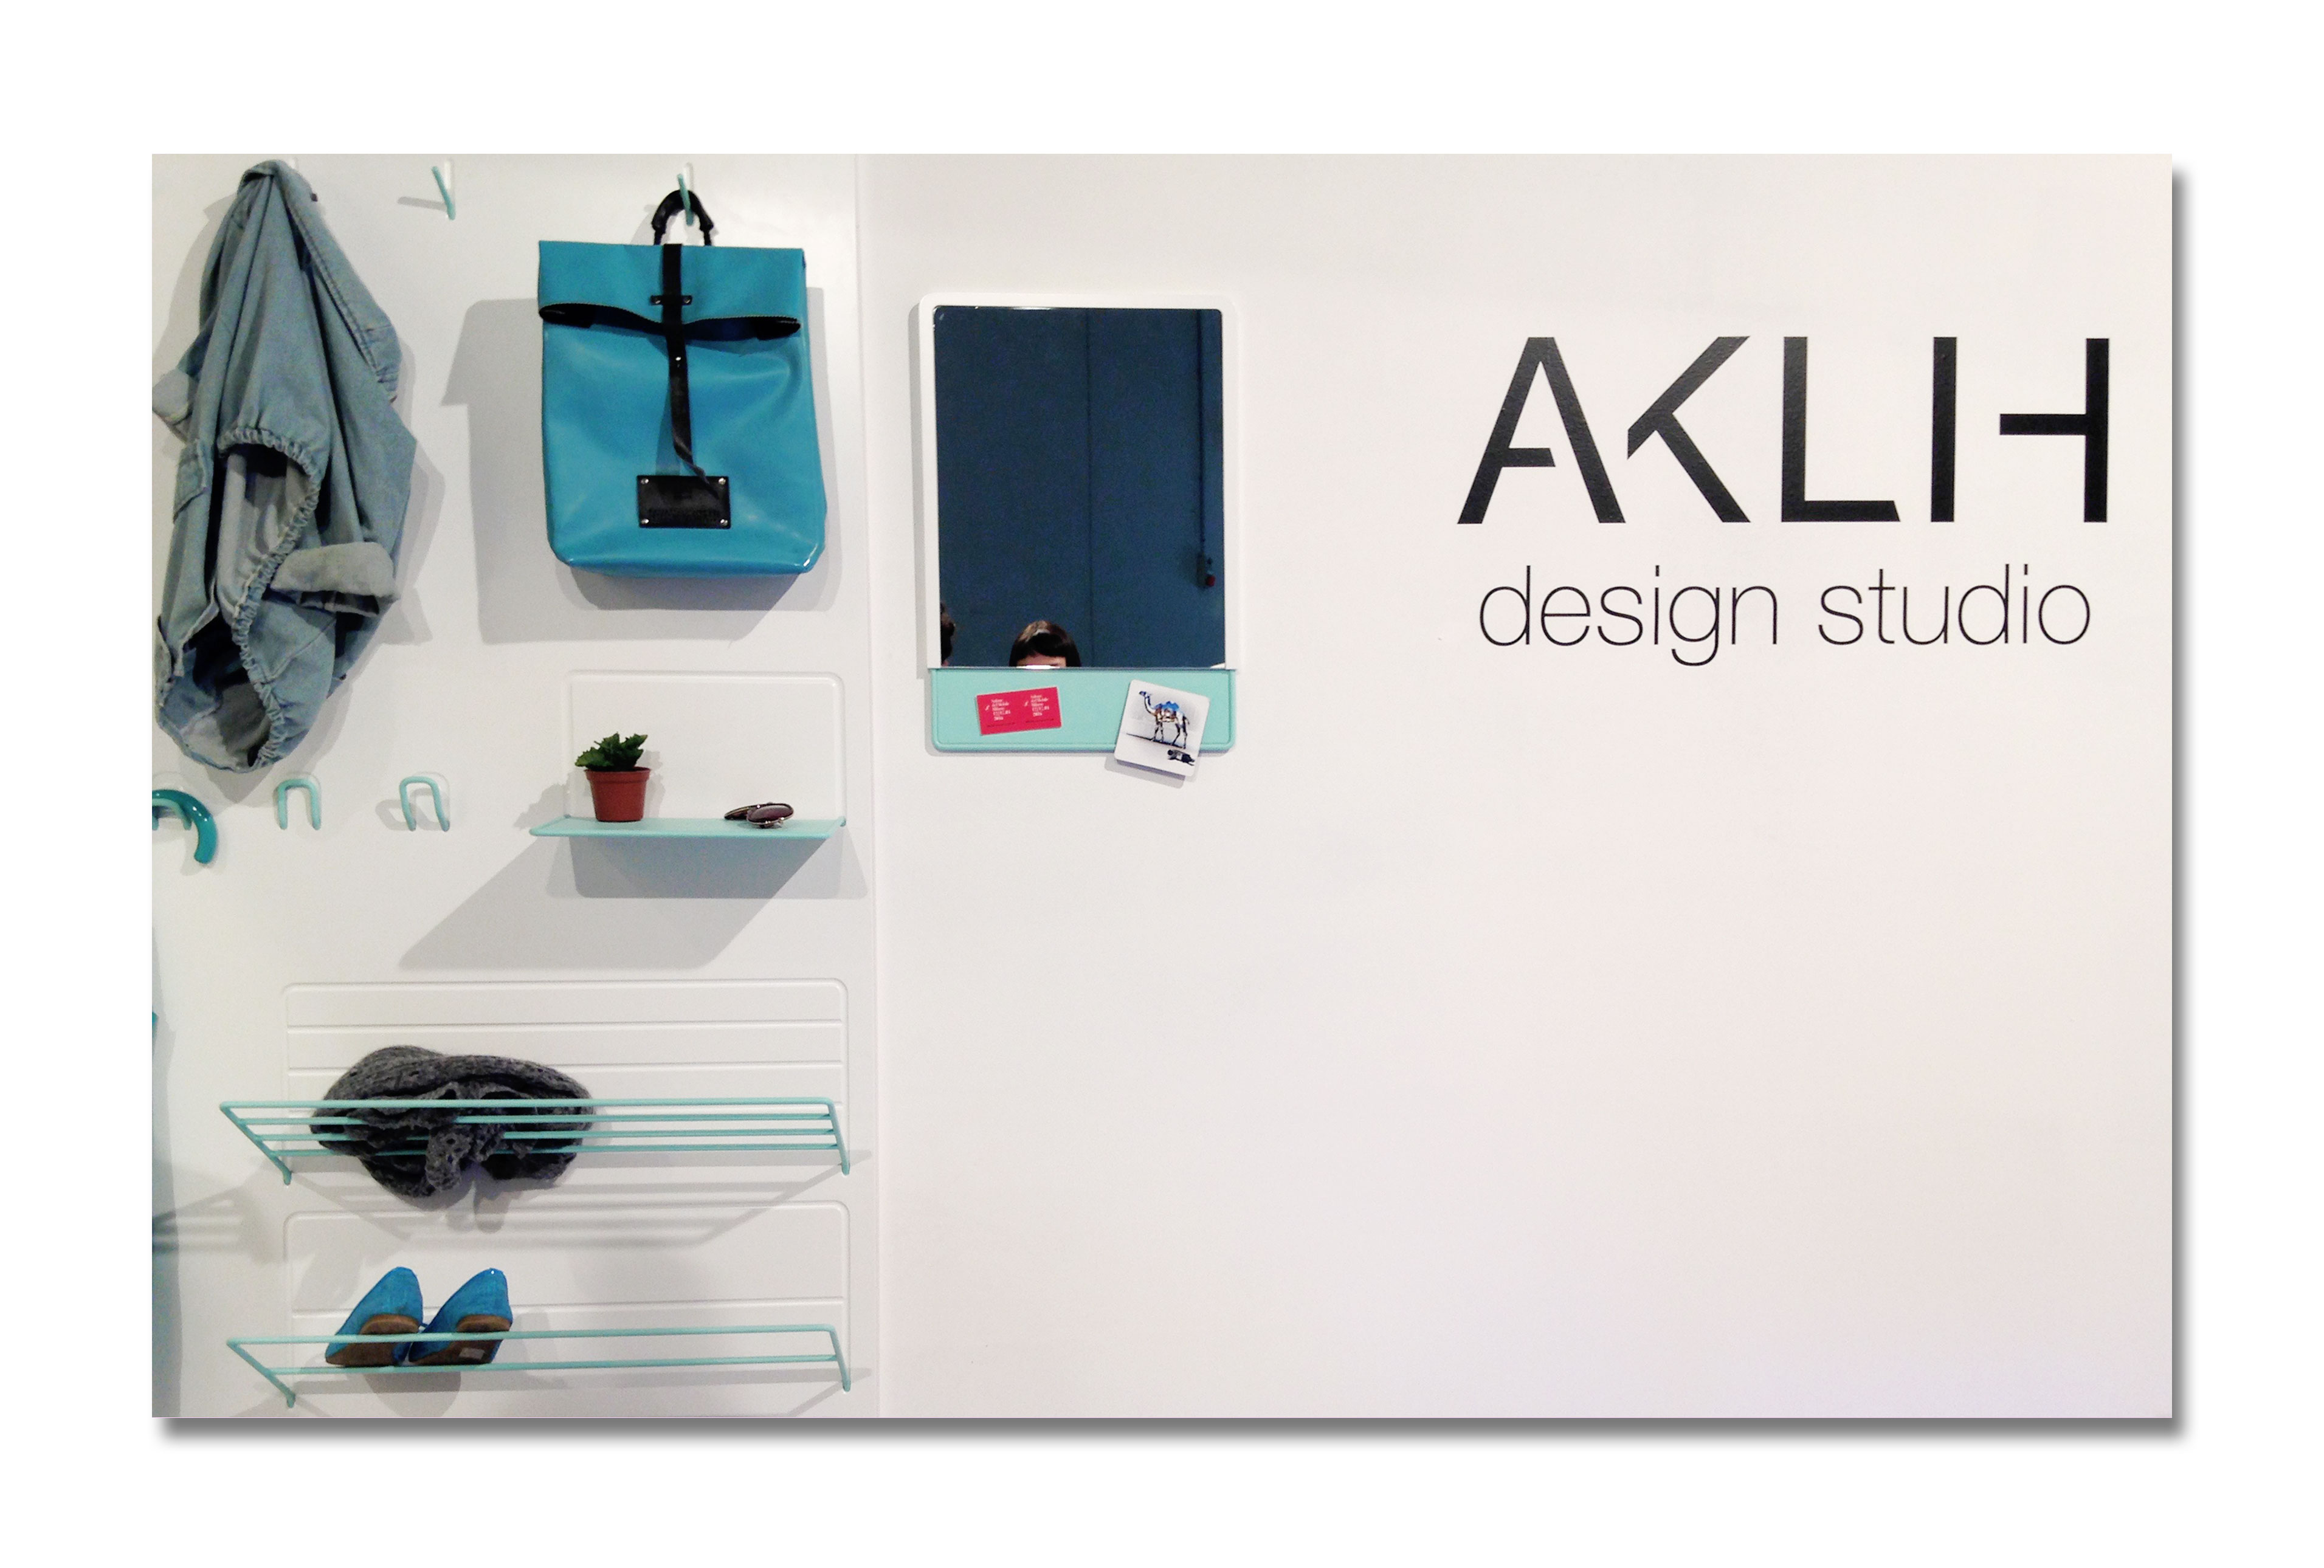 Aklih design studio